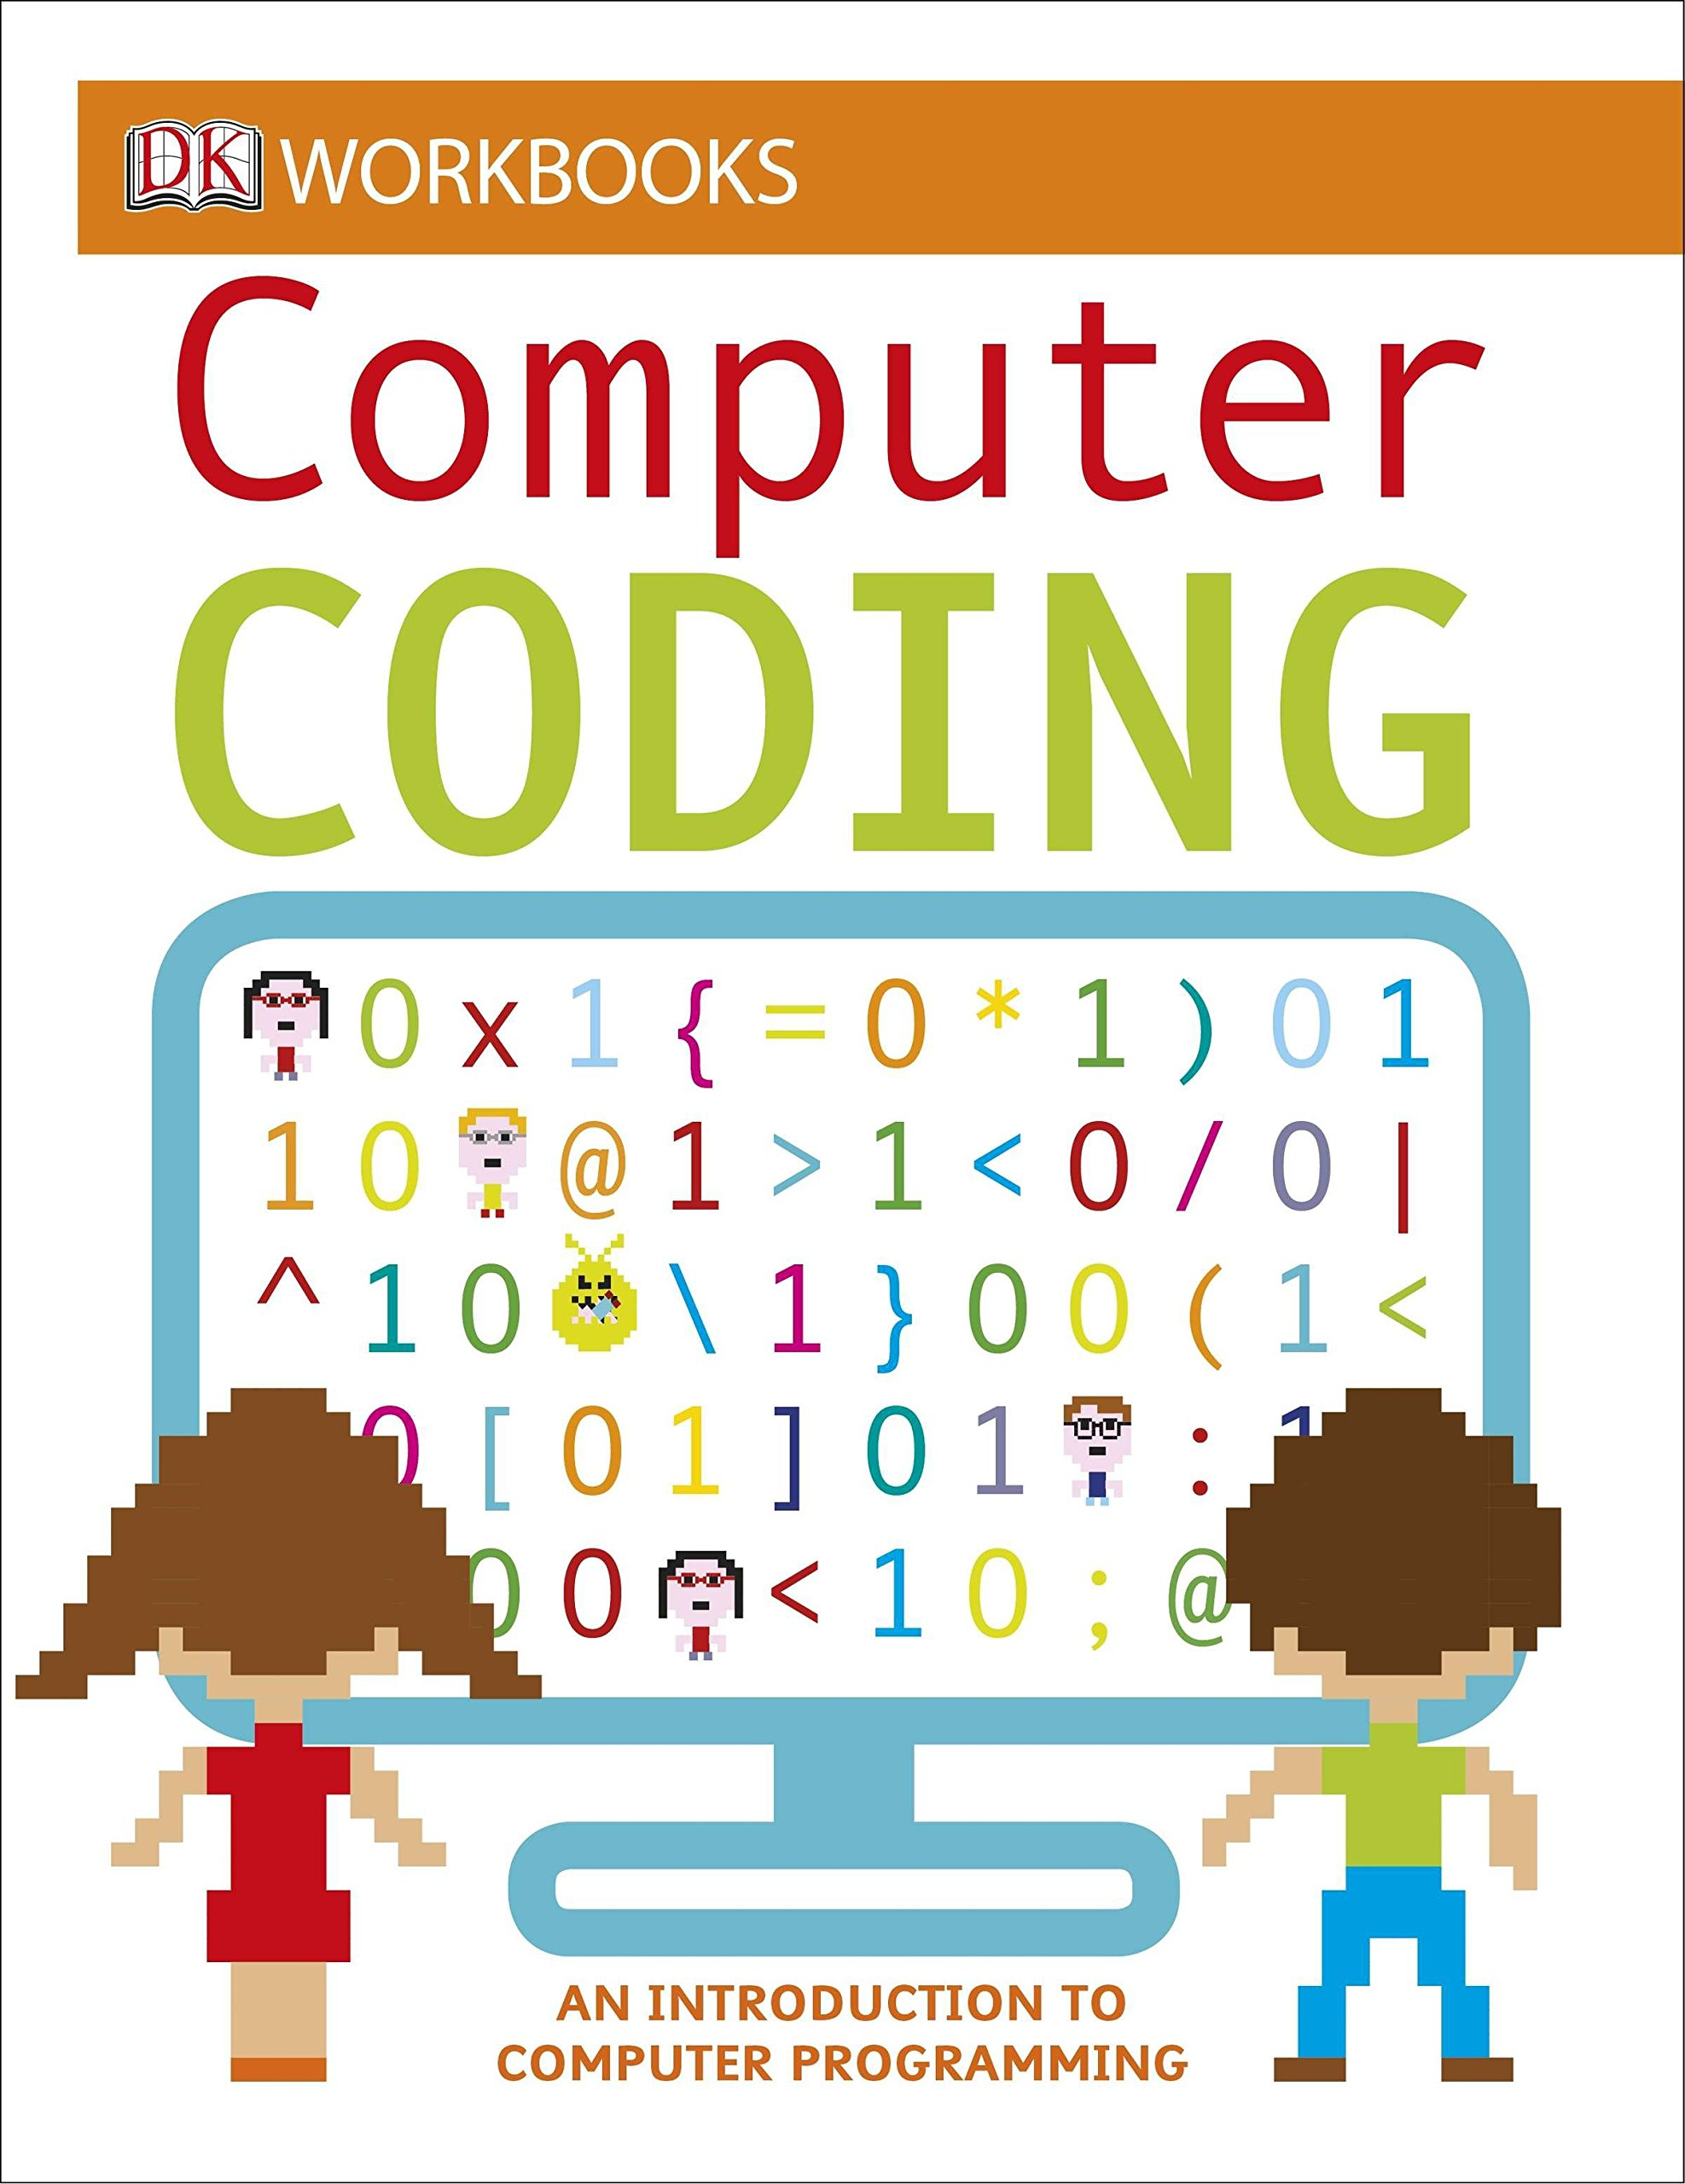 DK Workbooks: Computer Coding pdf epub